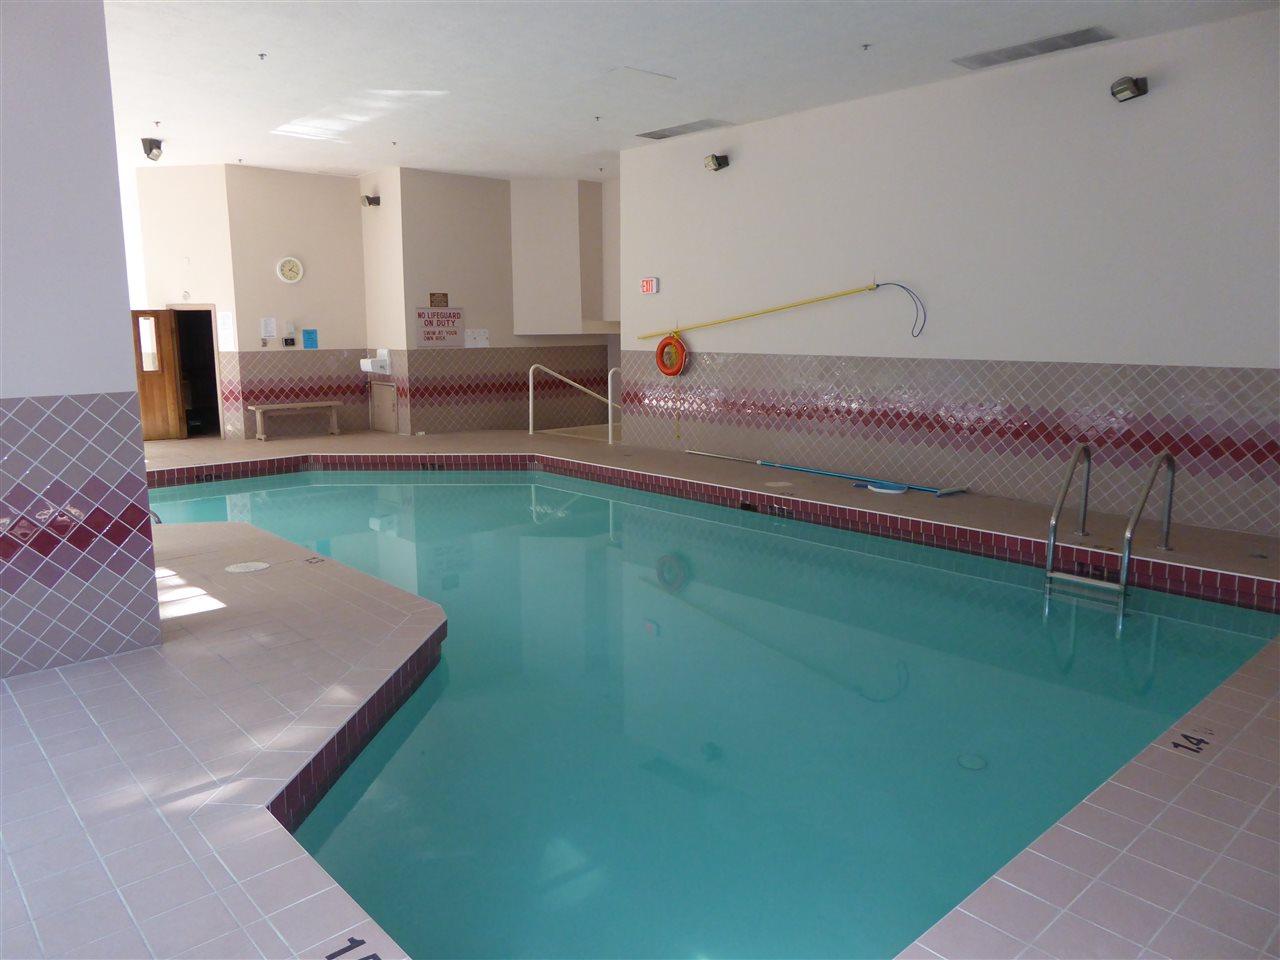 Condo Apartment at 1603 6282 KATHLEEN AVENUE, Unit 1603, Burnaby South, British Columbia. Image 9